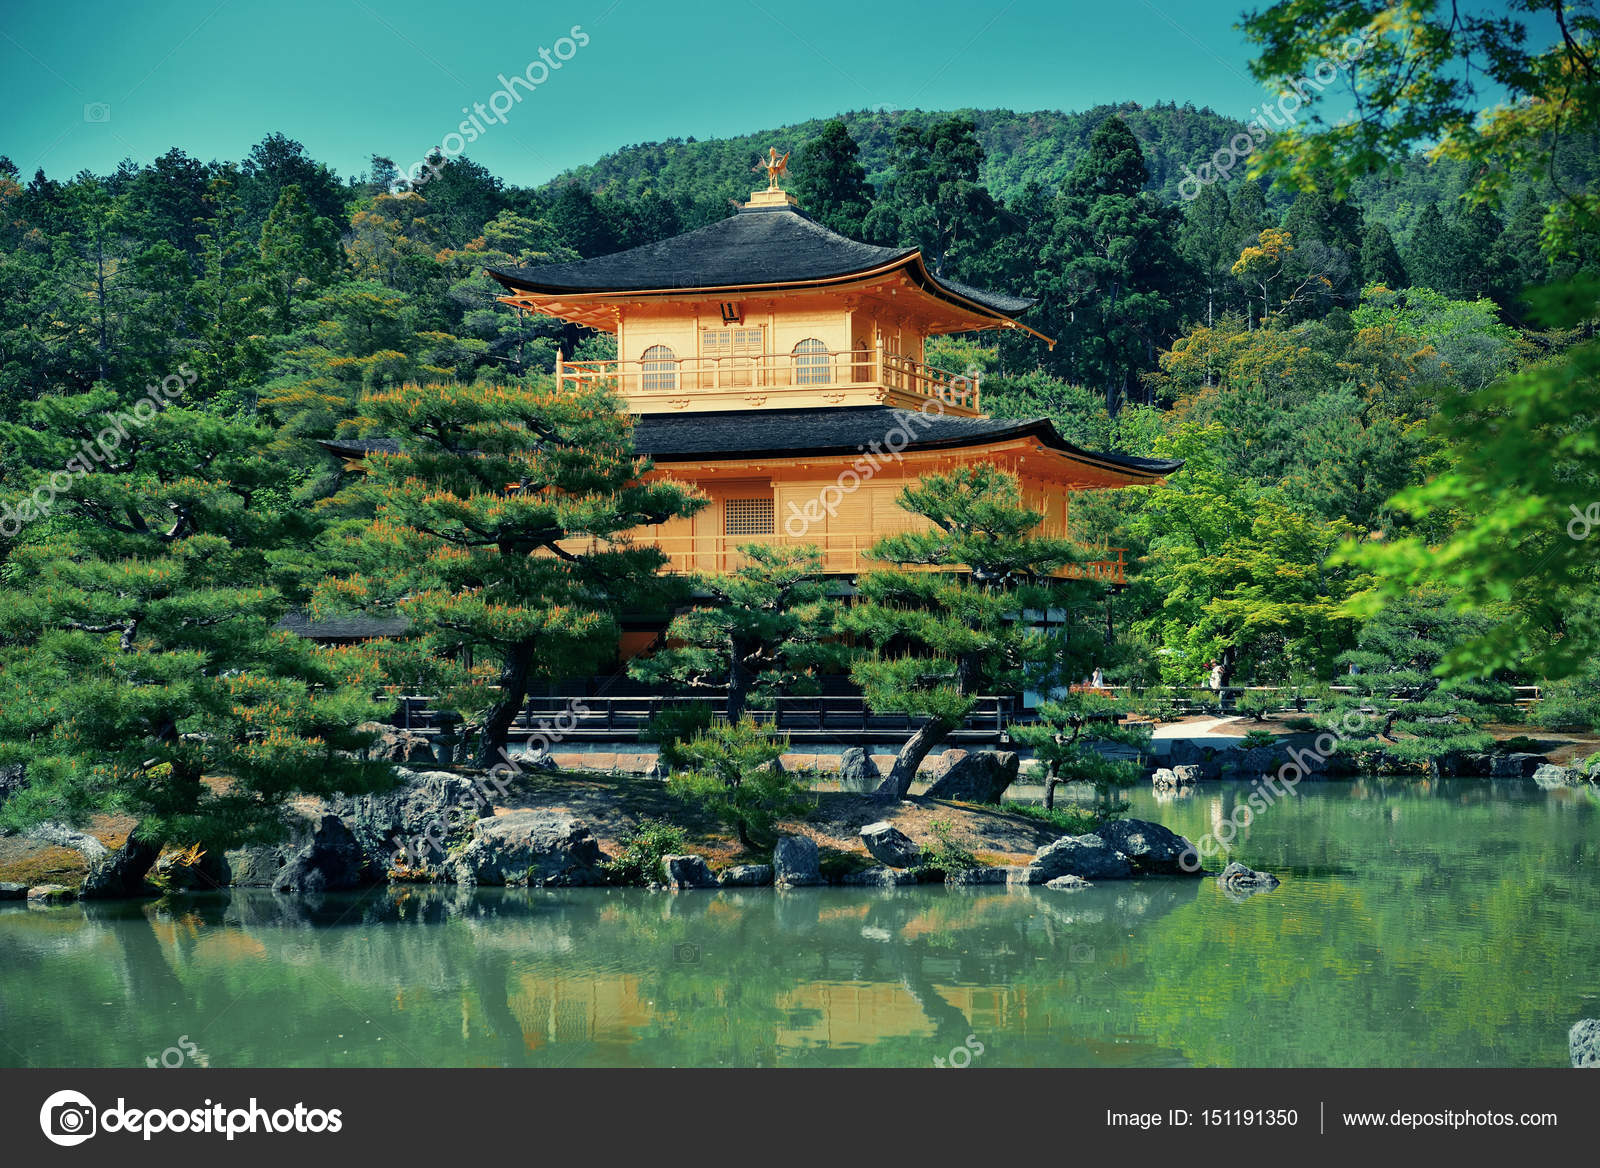 京都市の歴史的建造物 \u2014 ストック写真